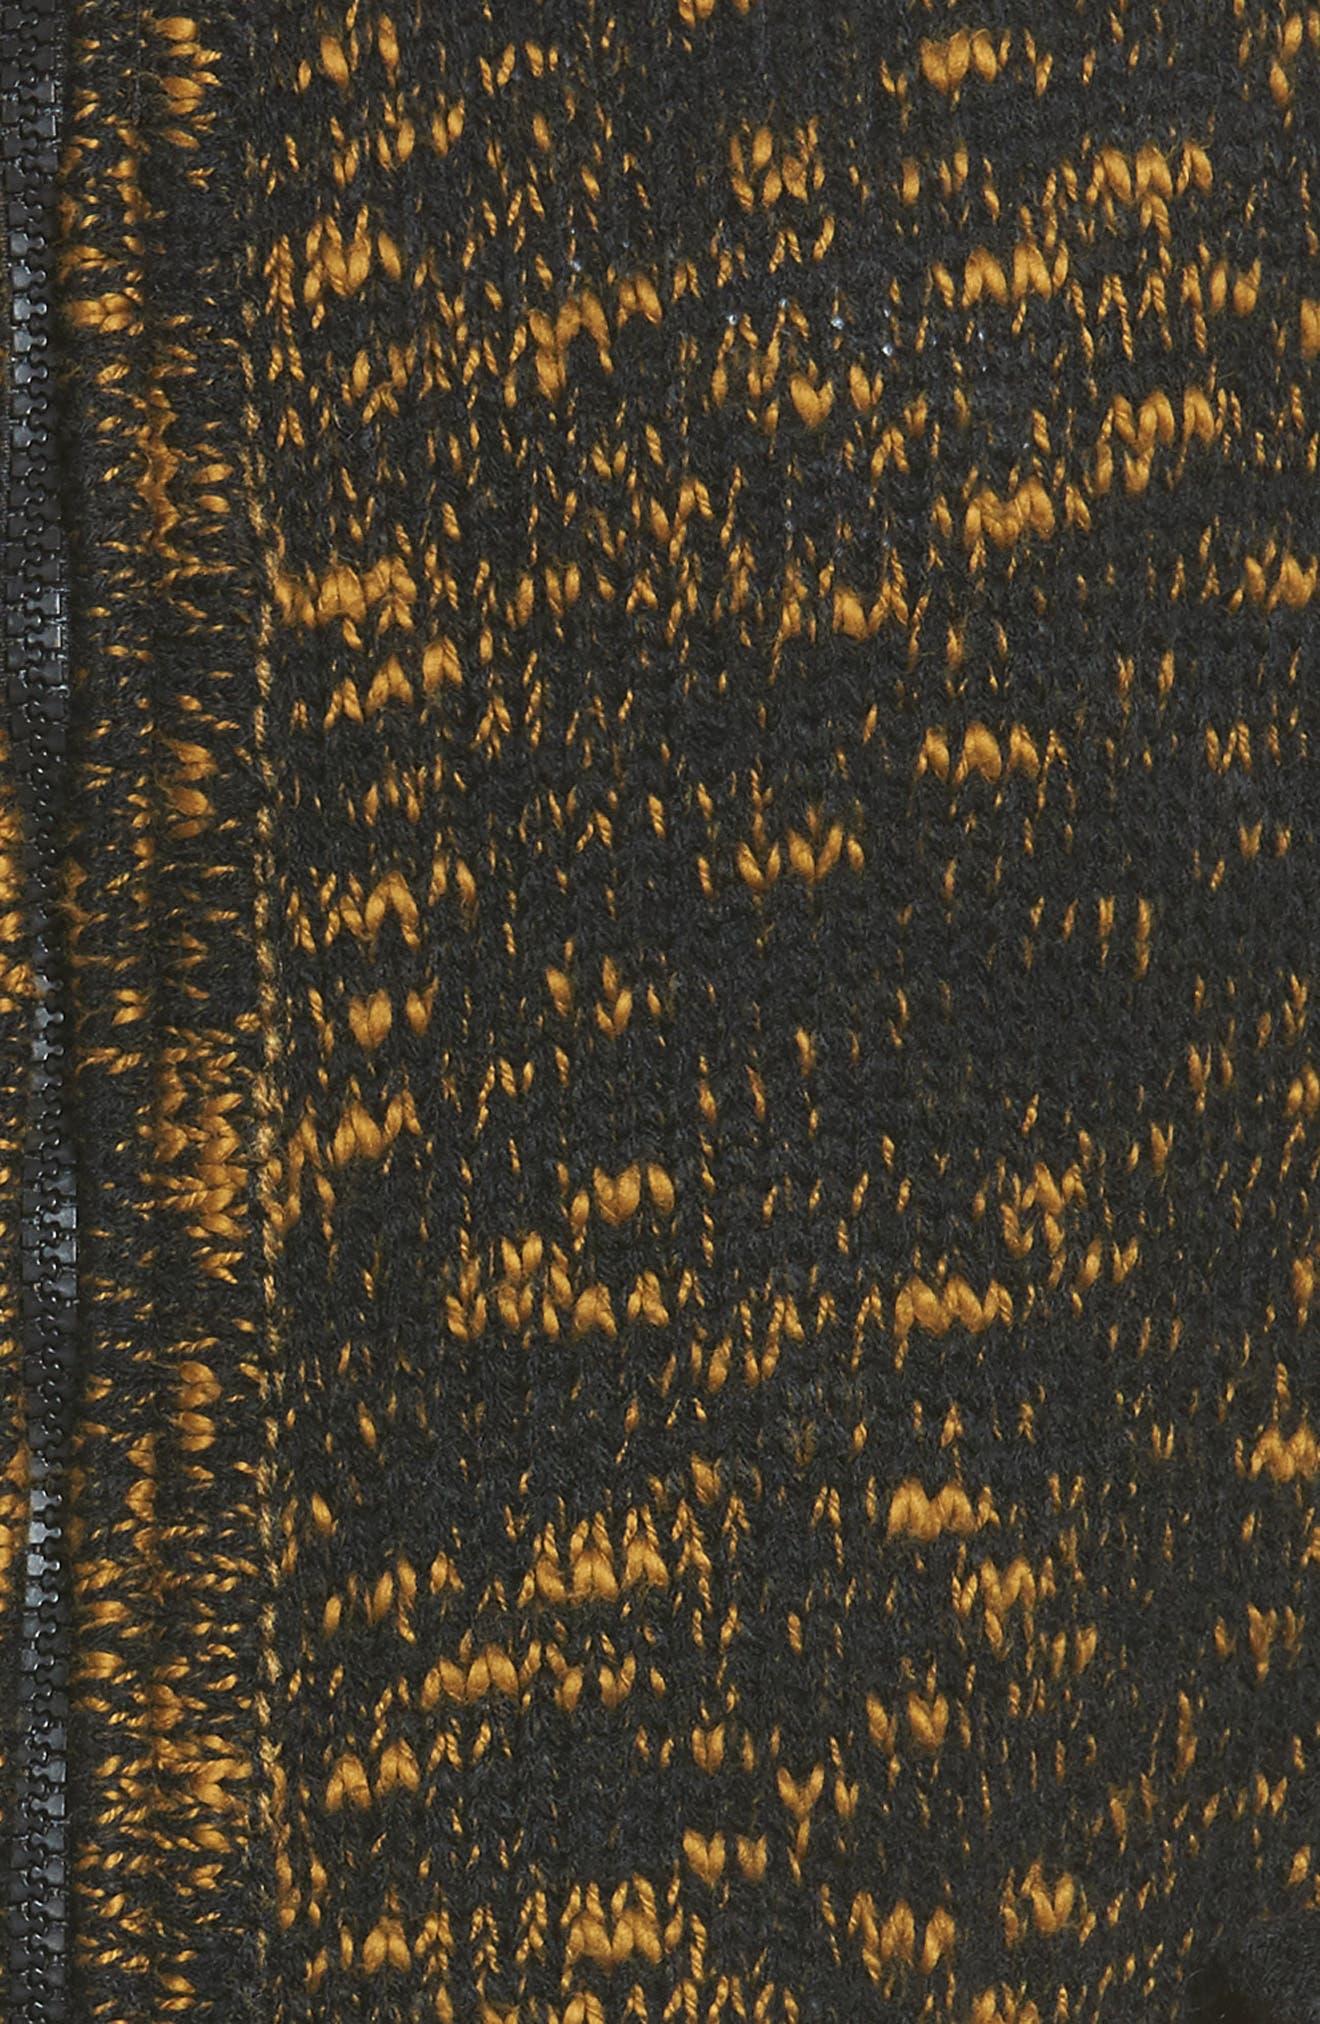 Tunnel Vision Zip Jacket,                             Alternate thumbnail 5, color,                             Olive Multi